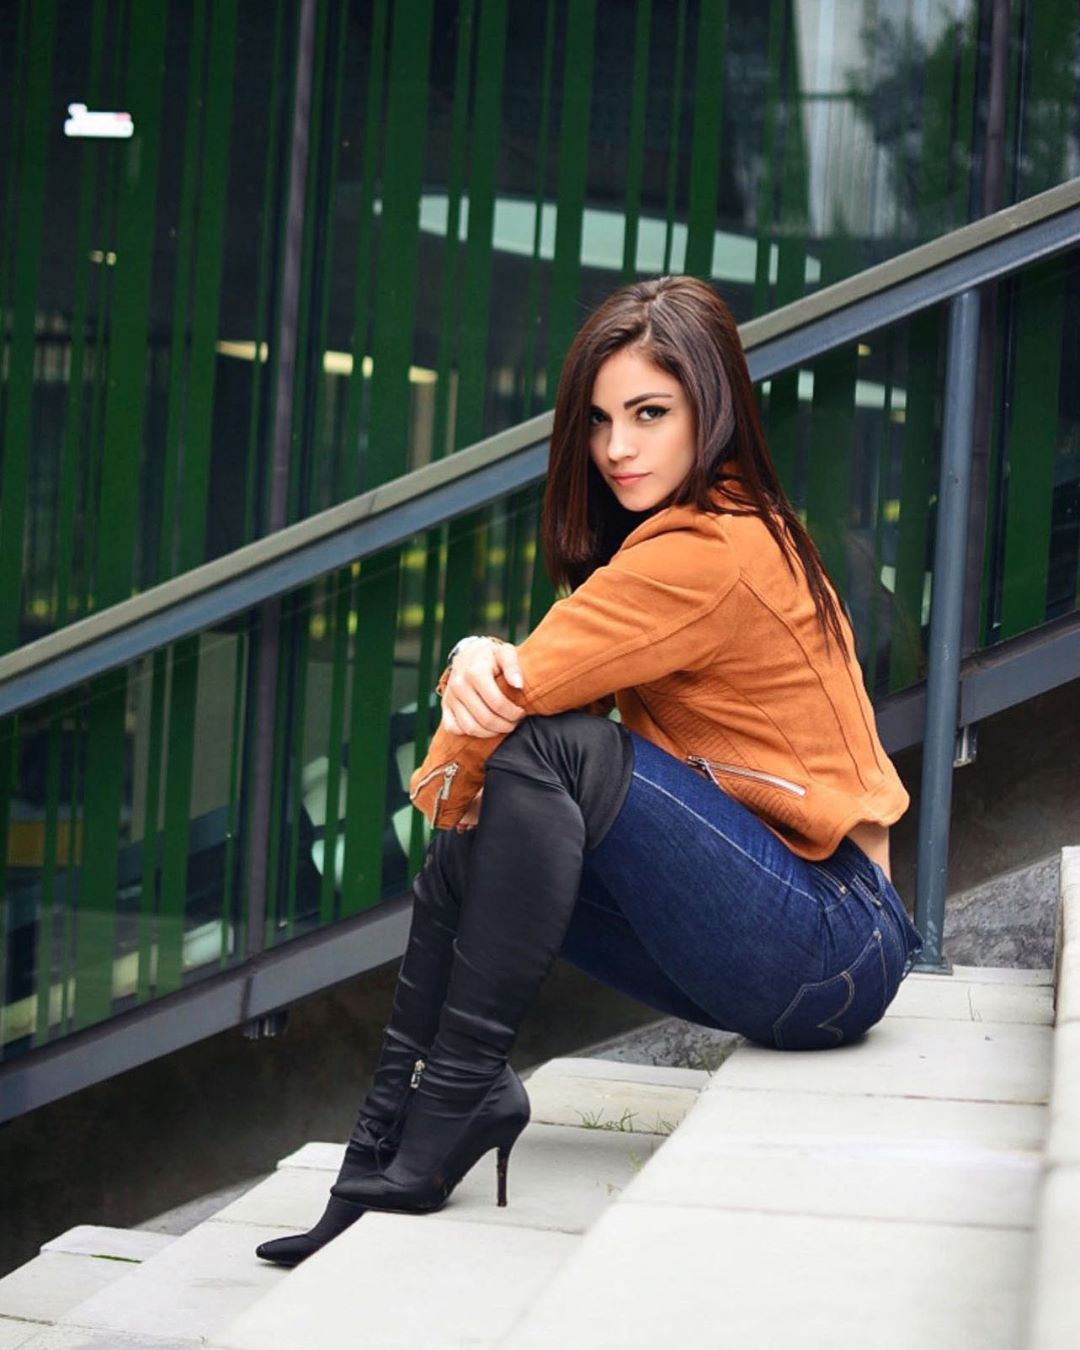 Valentina-Garzon-Wallpapers-Insta-Fit-Bio-4